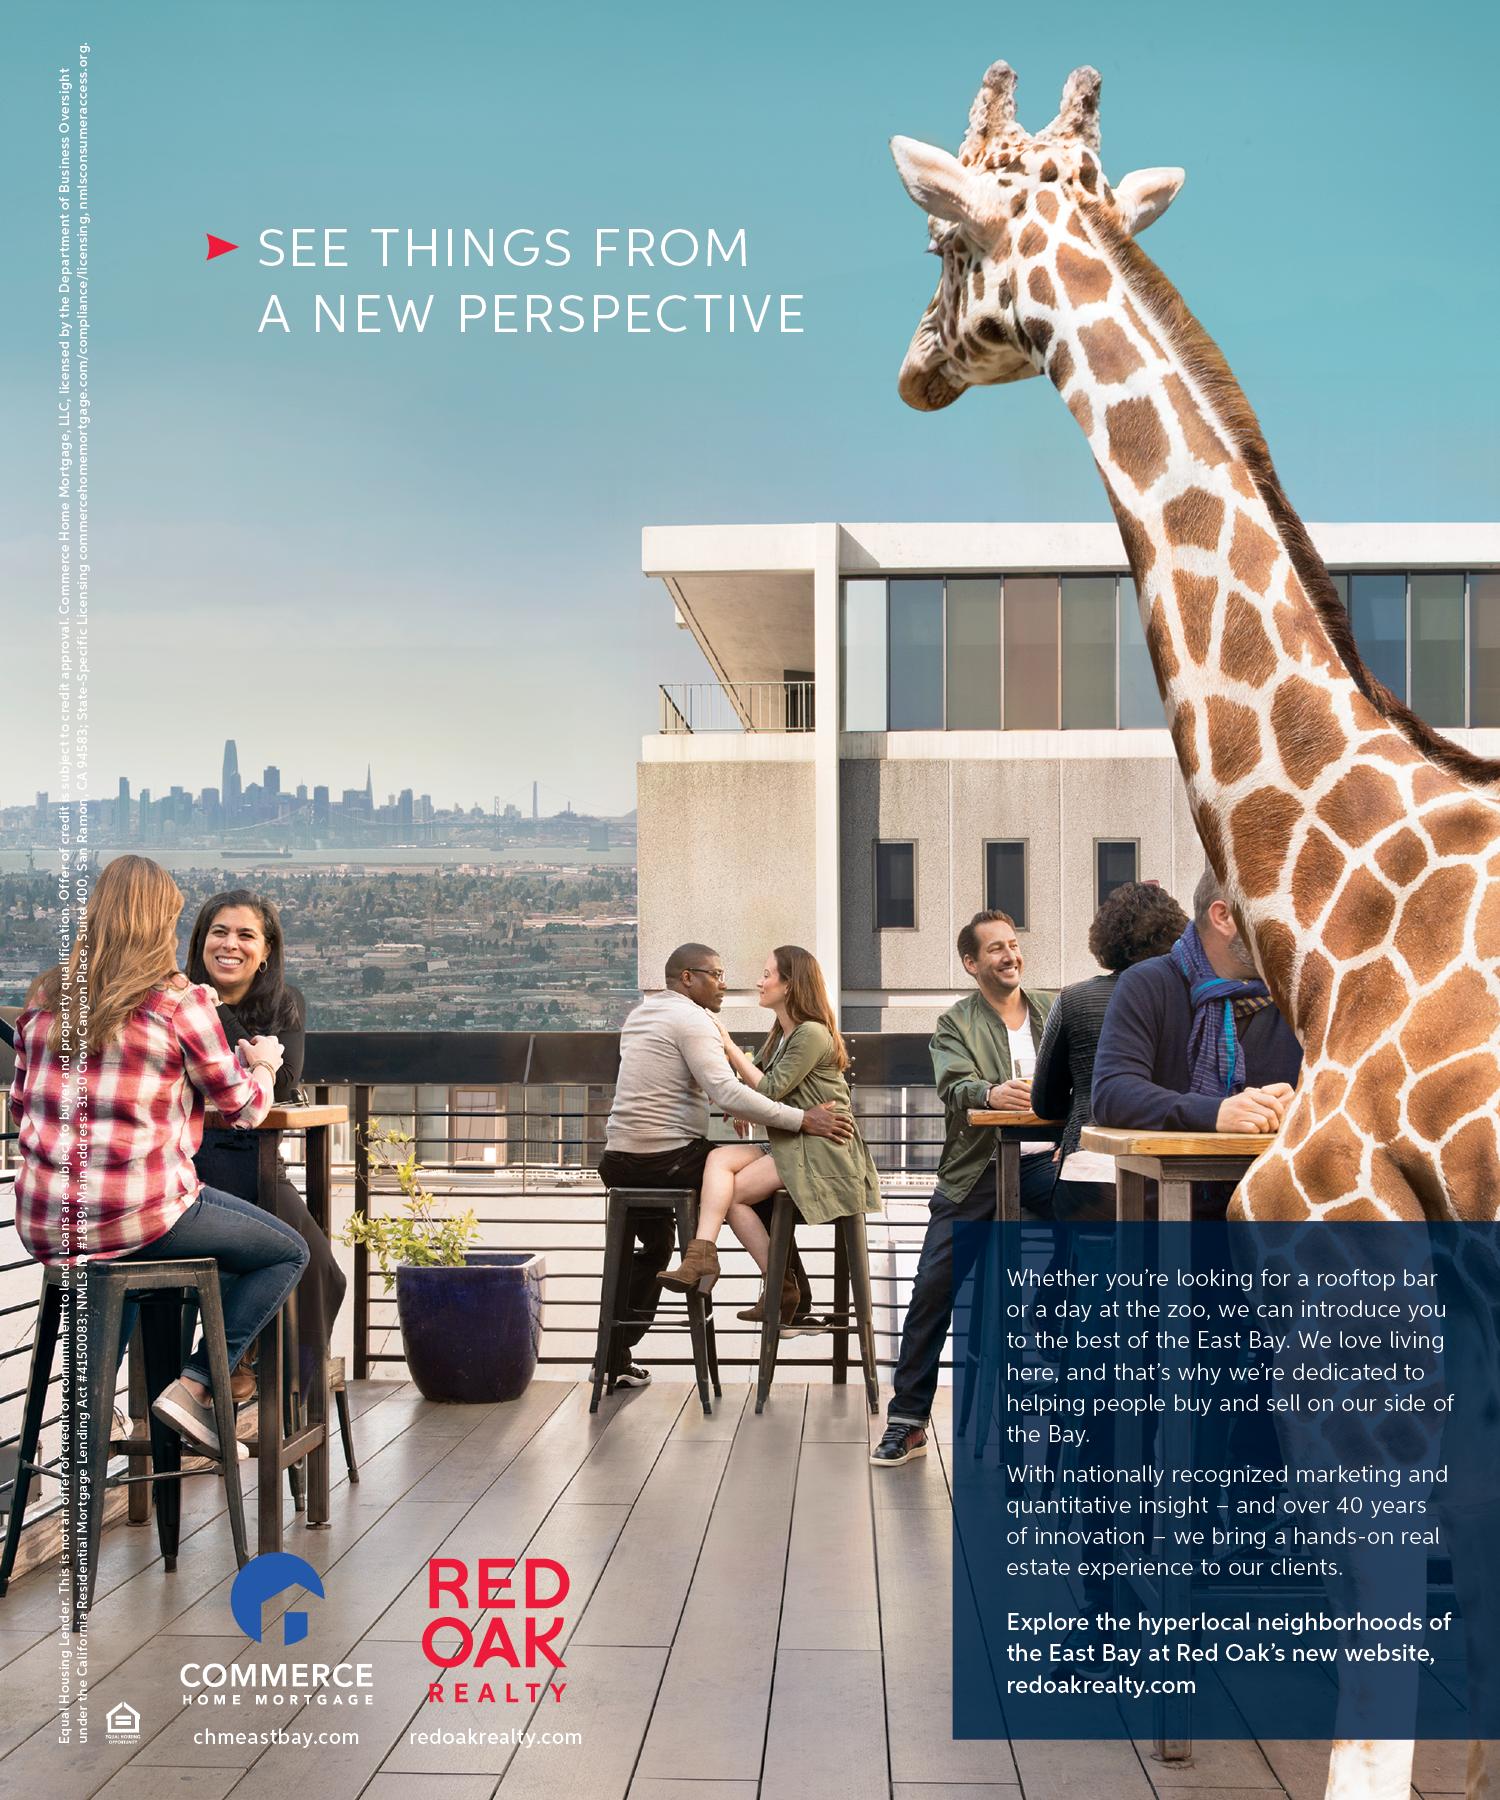 San Francisco Magazine | Jun 2019 | Red Oak Realty 2019 ad campaign